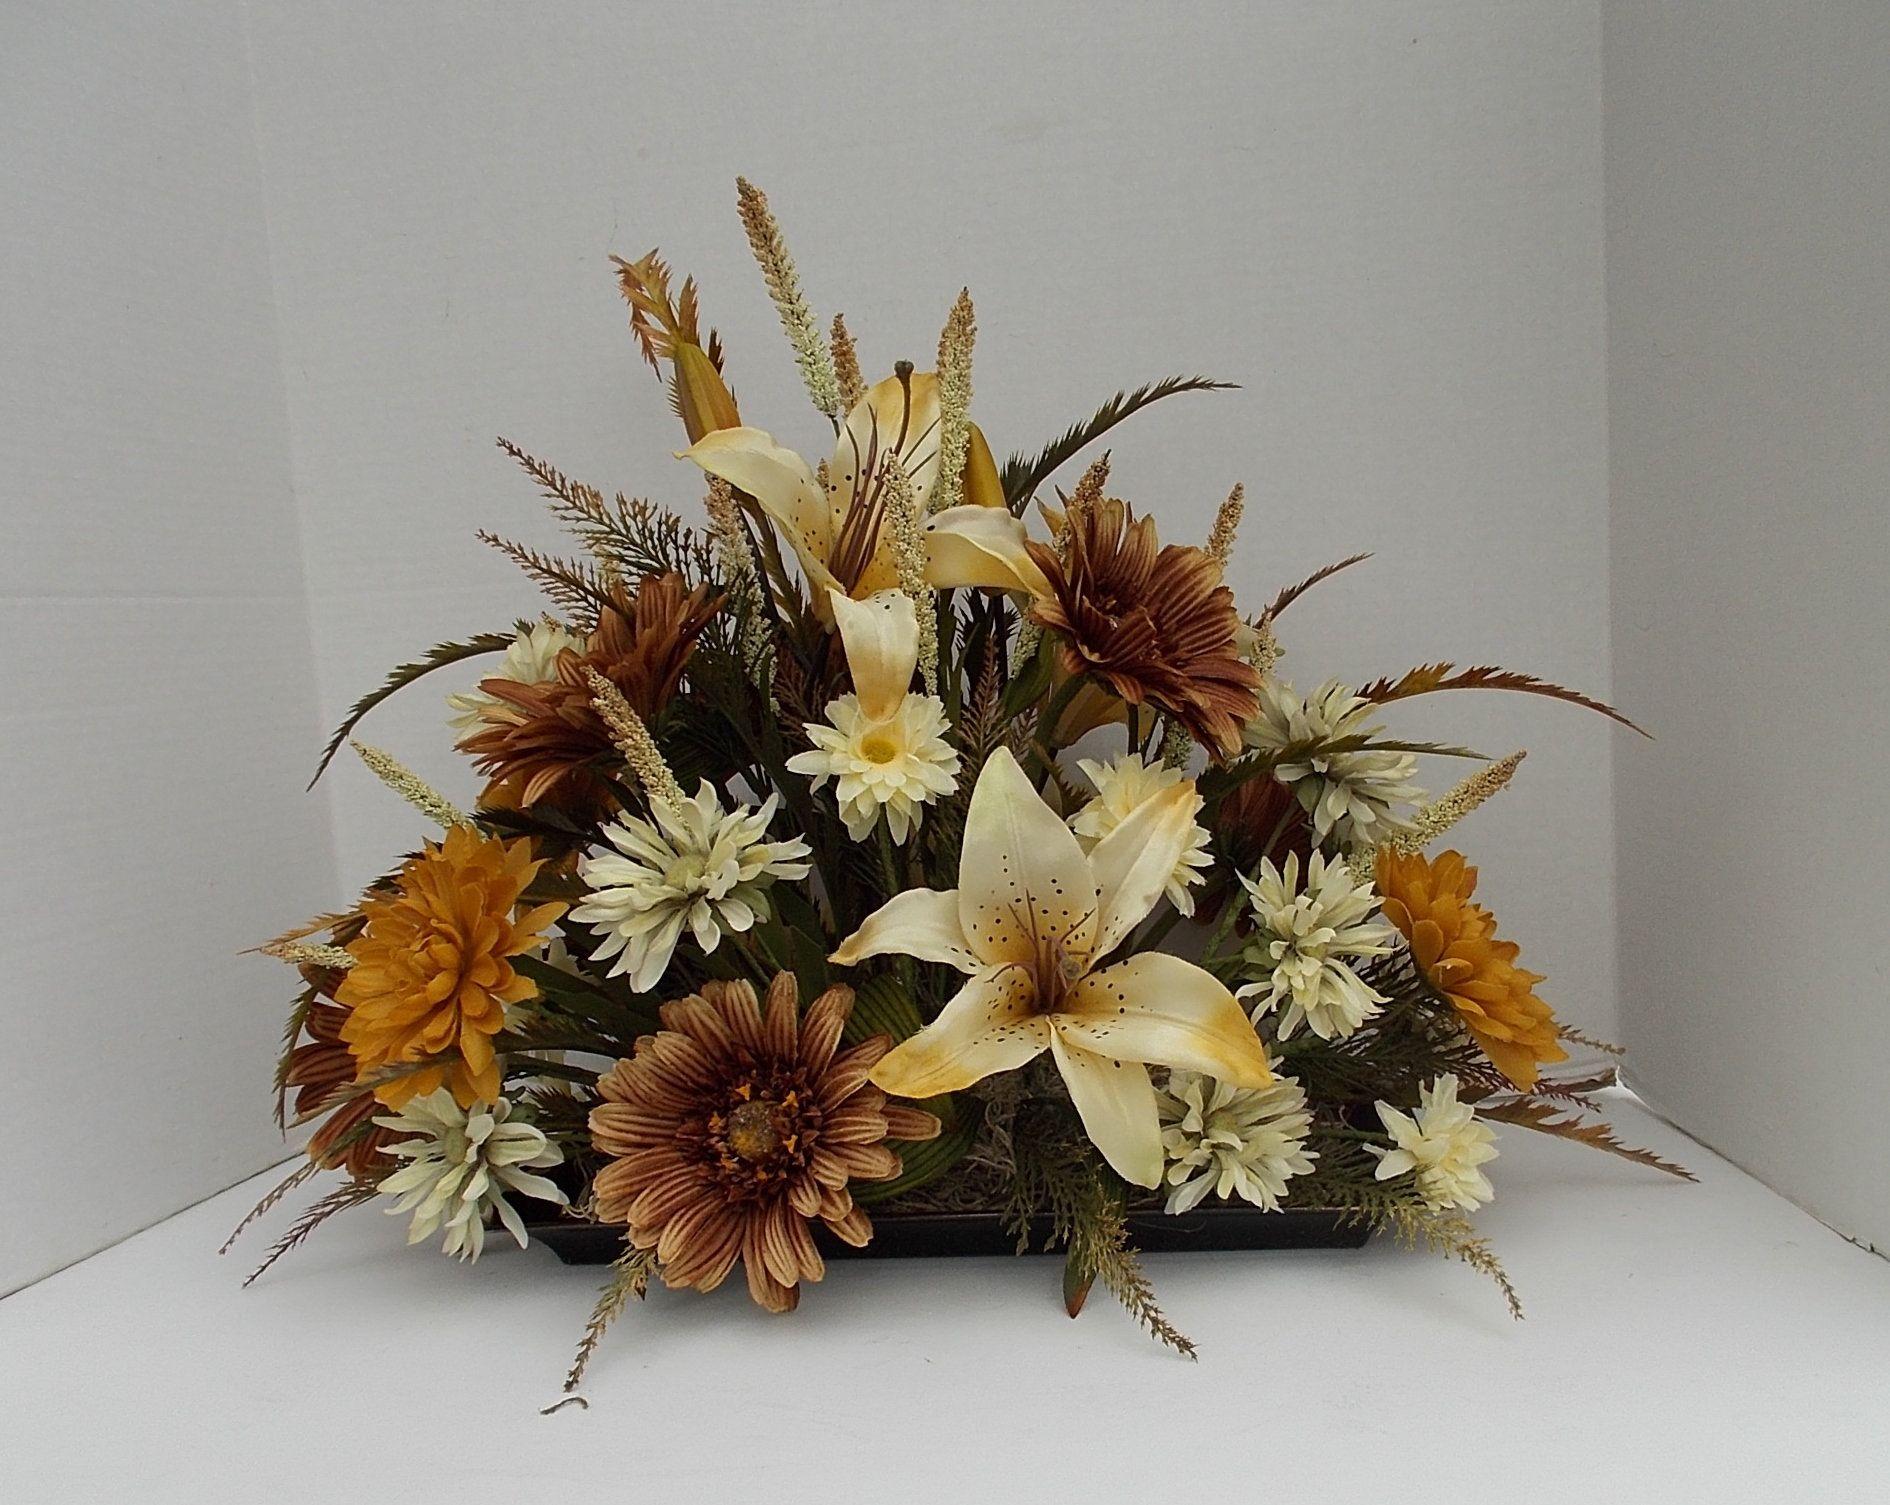 Silk Lily And Gerbera Flower Arrangement Table Centerpiece By Flowersandfrills On Etsy Gerbera Flower Flower Arrangements Silk Flowers